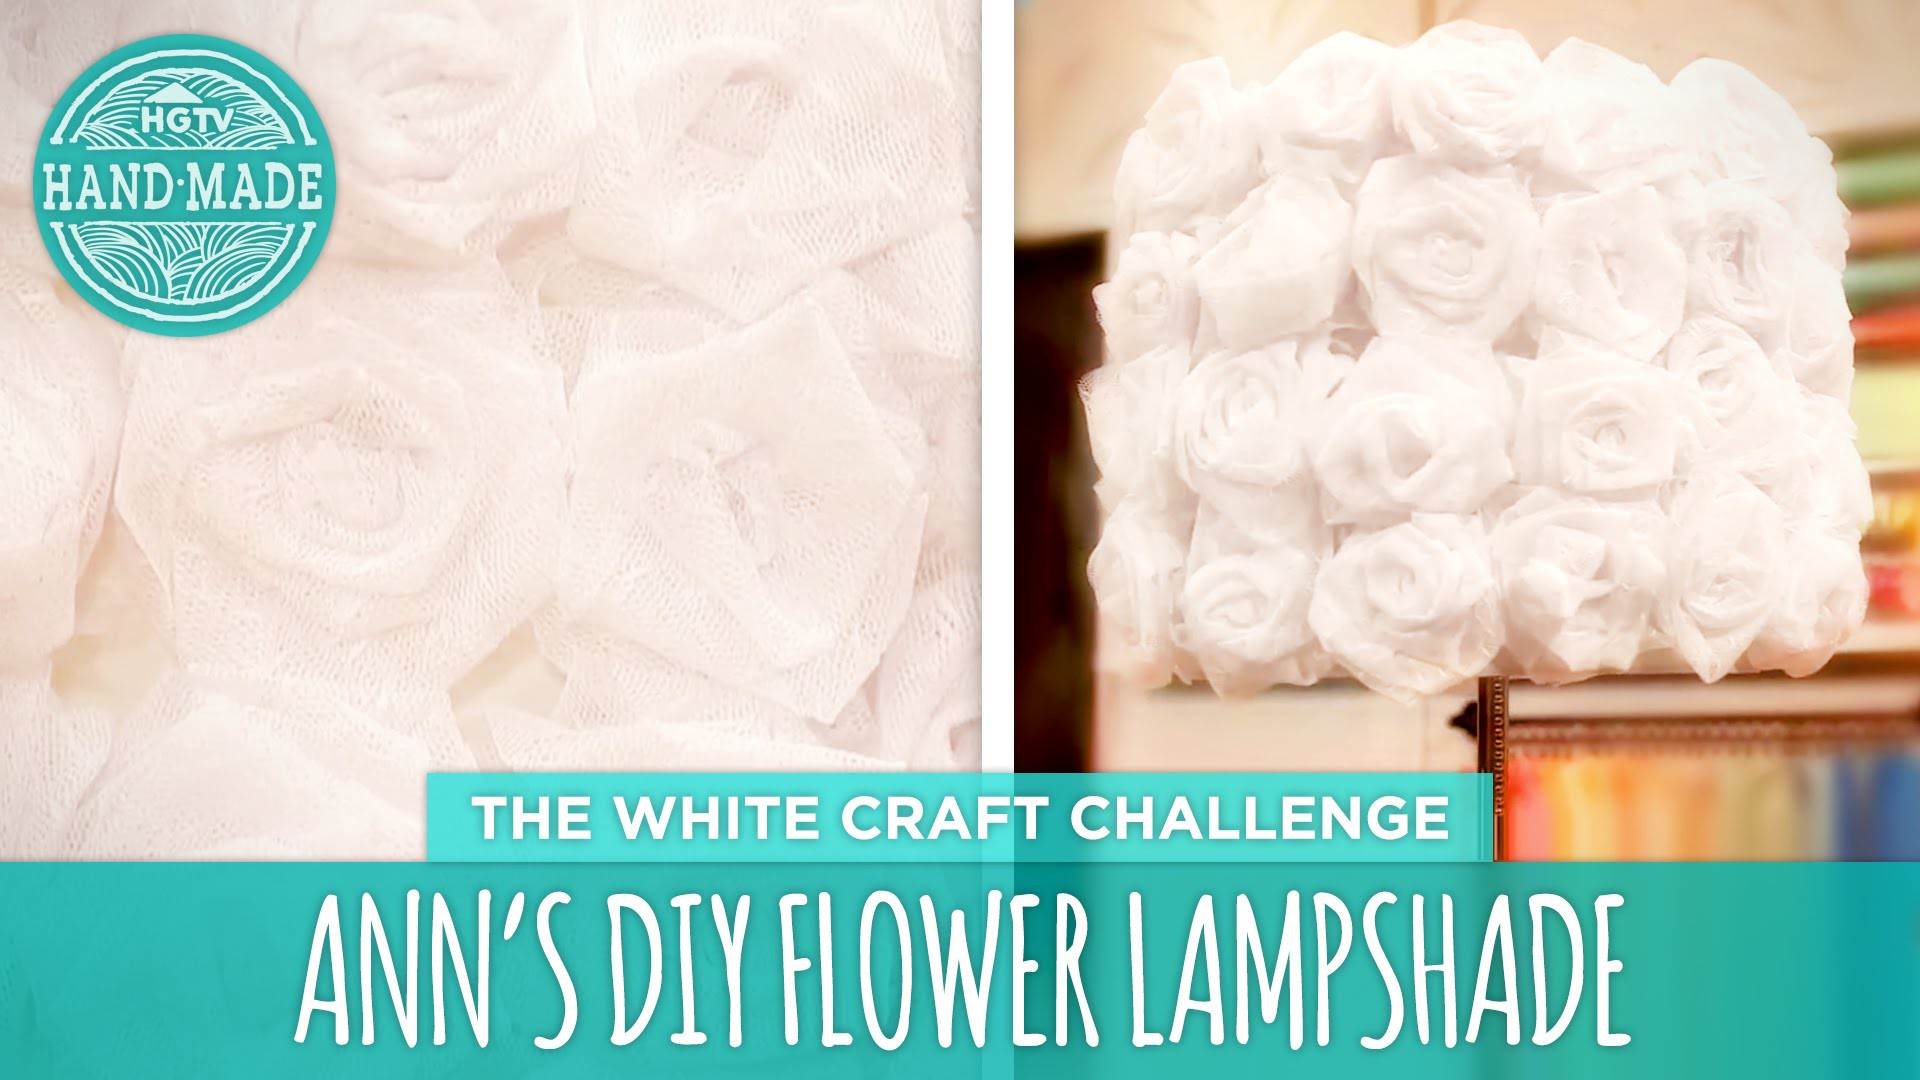 Ann's DIY Flower Lamp - HGTV Handmade White Craft Challenge